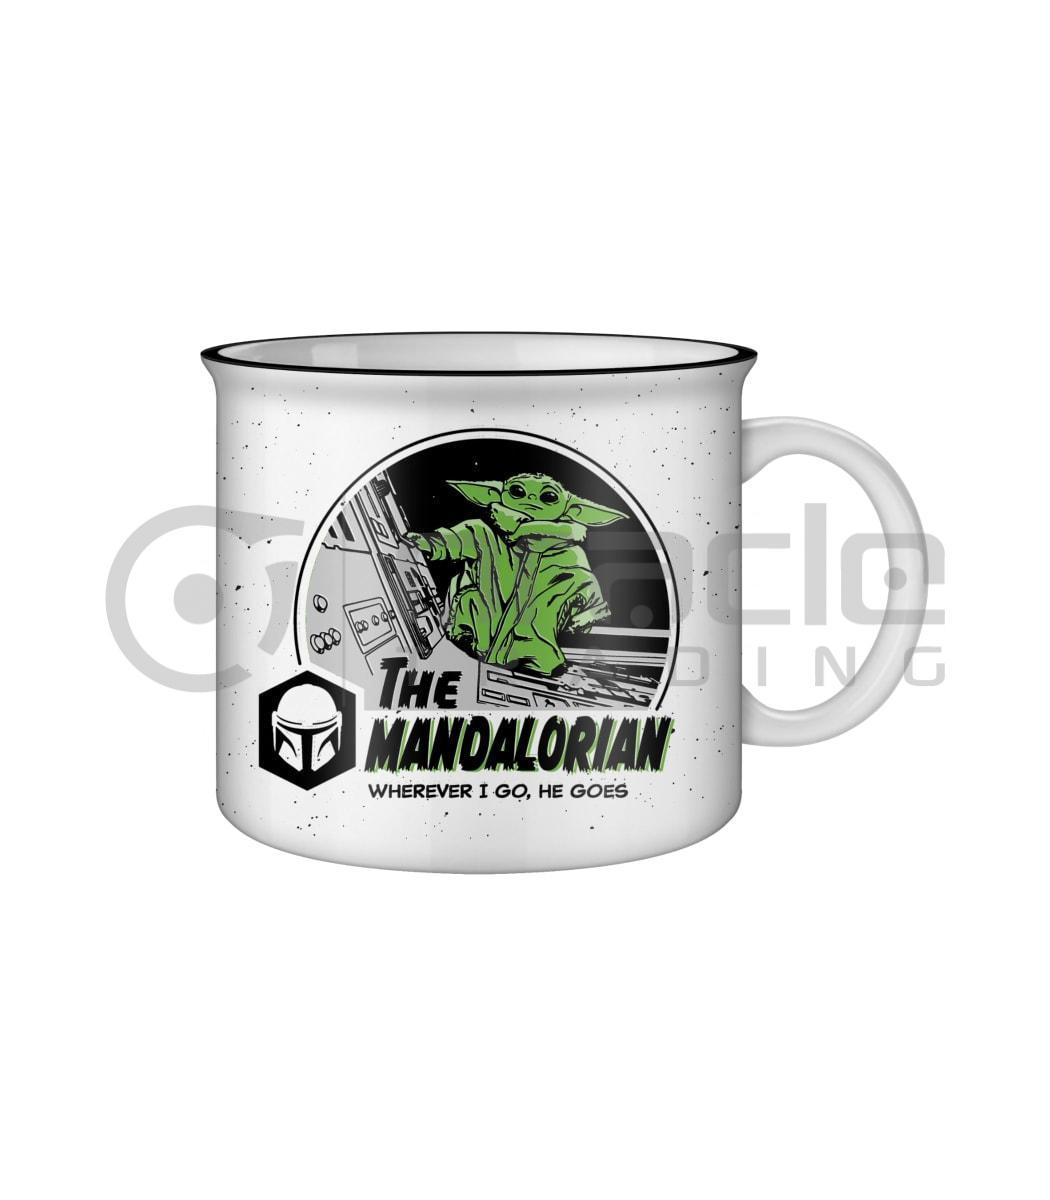 Star Wars: The Mandalorian Jumbo Camper Mug - Together